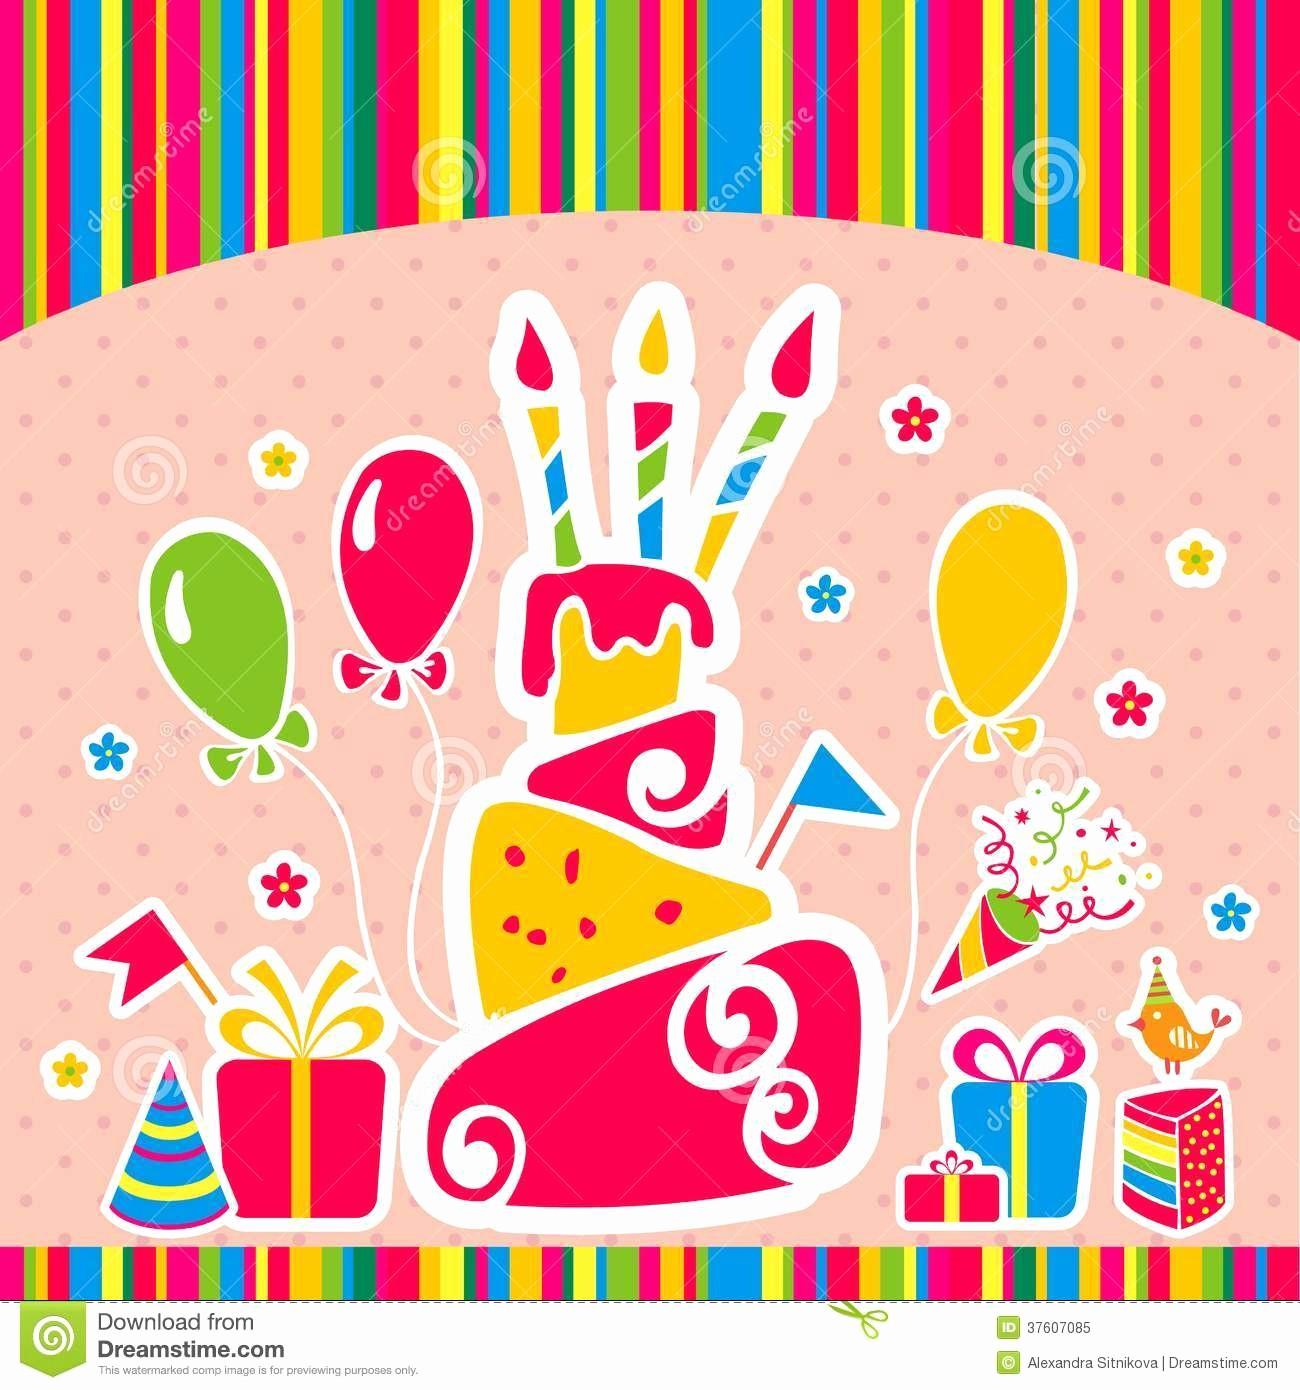 Fondos Para Tarjetas De Cumpleaños Best Of Fondo Del Feliz Cumpleaños Del Vector Tarjeta De